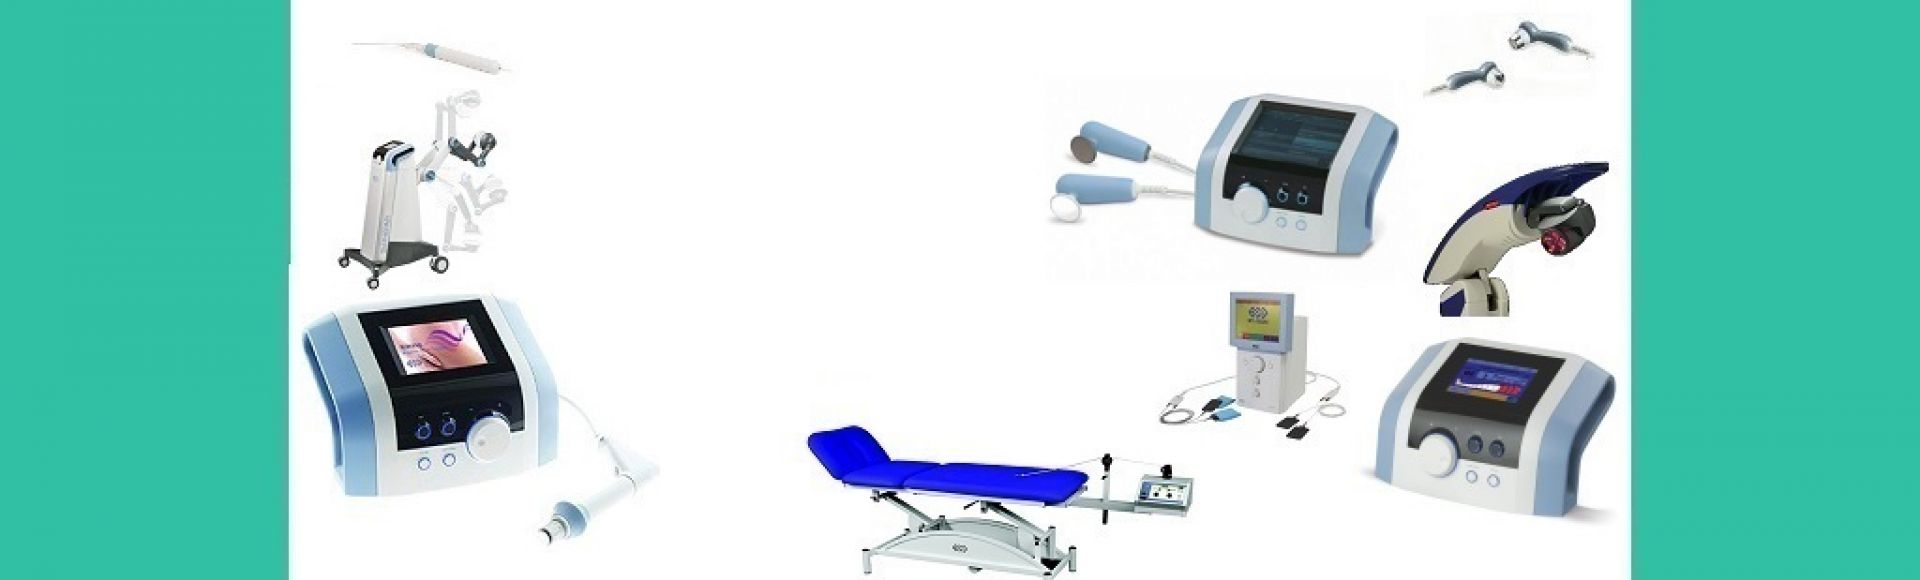 ARSMED Fizioterapie